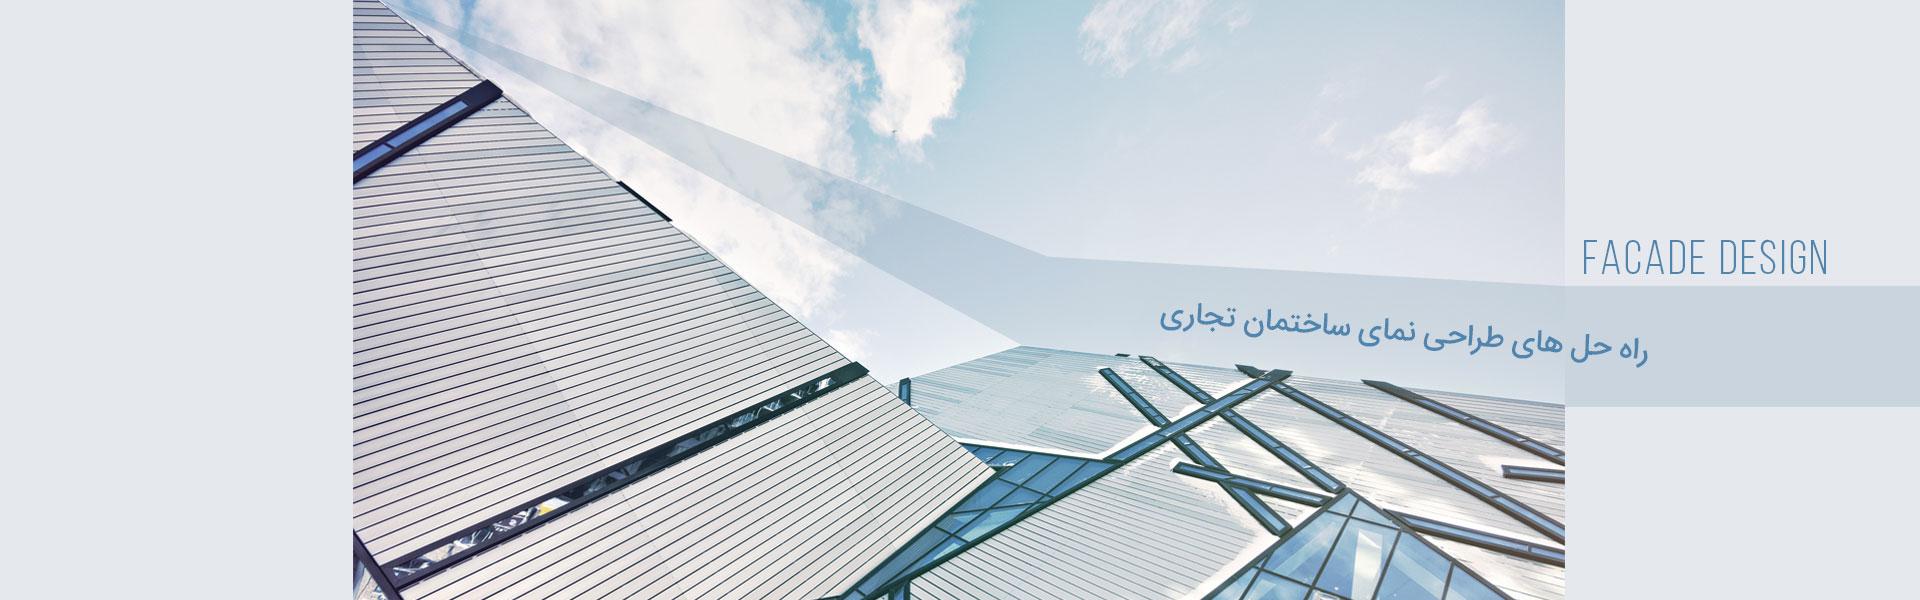 decorasion tarahi nama1 - راه حل های طراحی نمای ساختمان تجاری